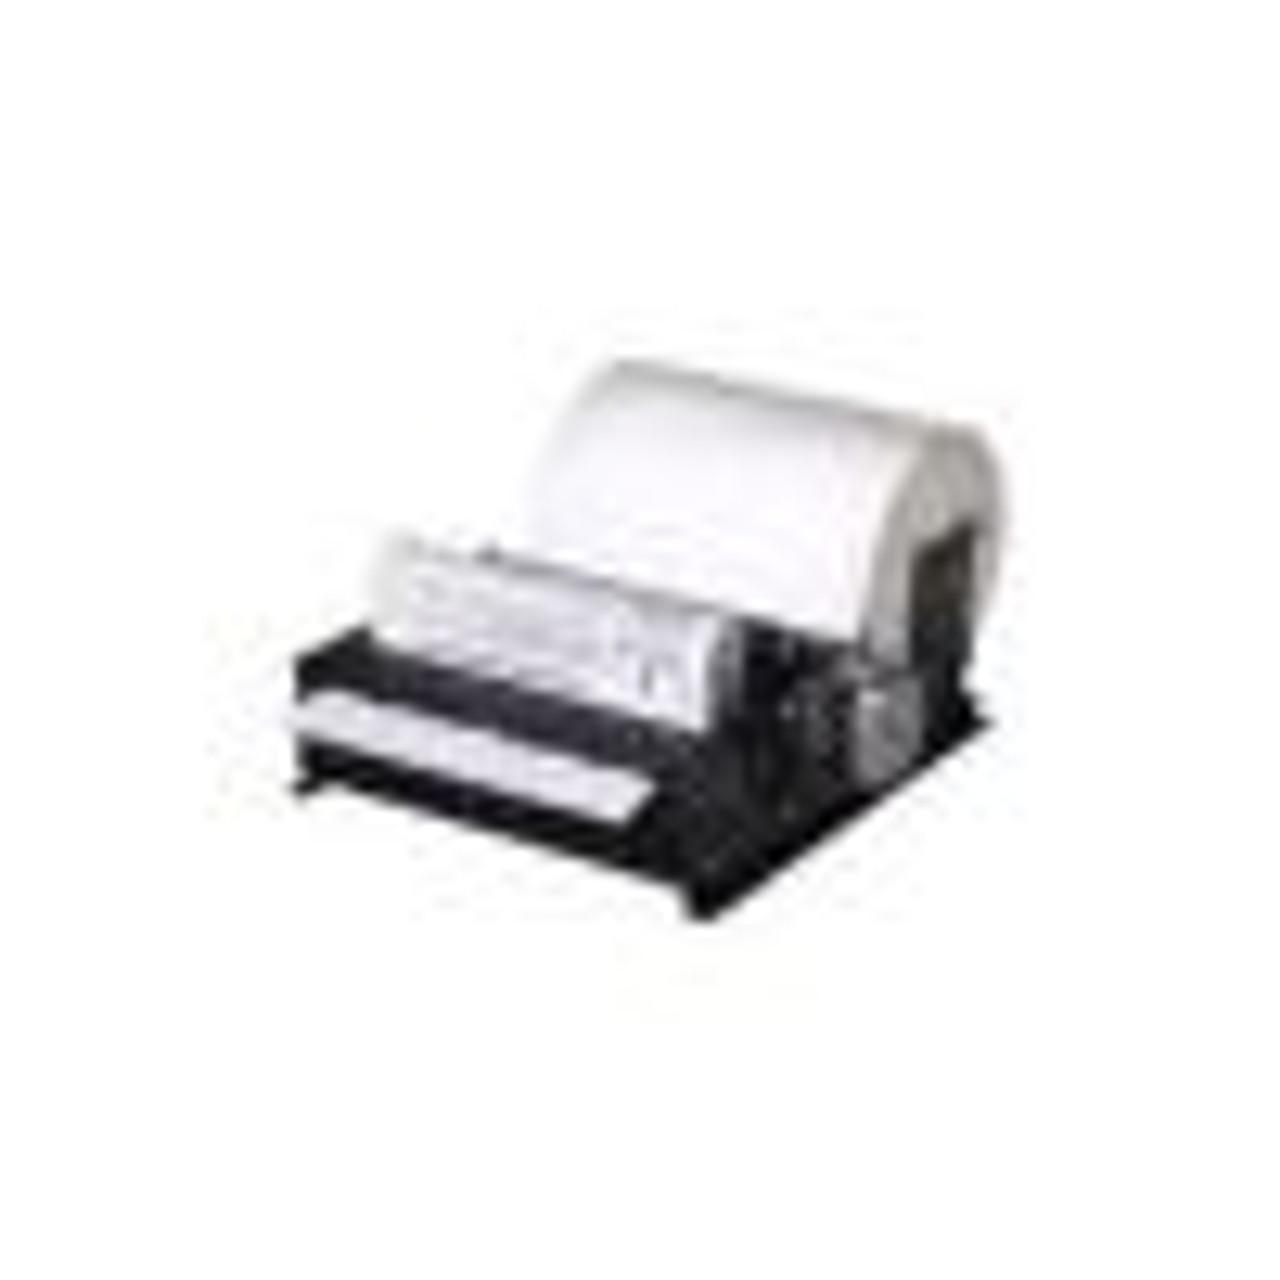 TTP 8200 Printers